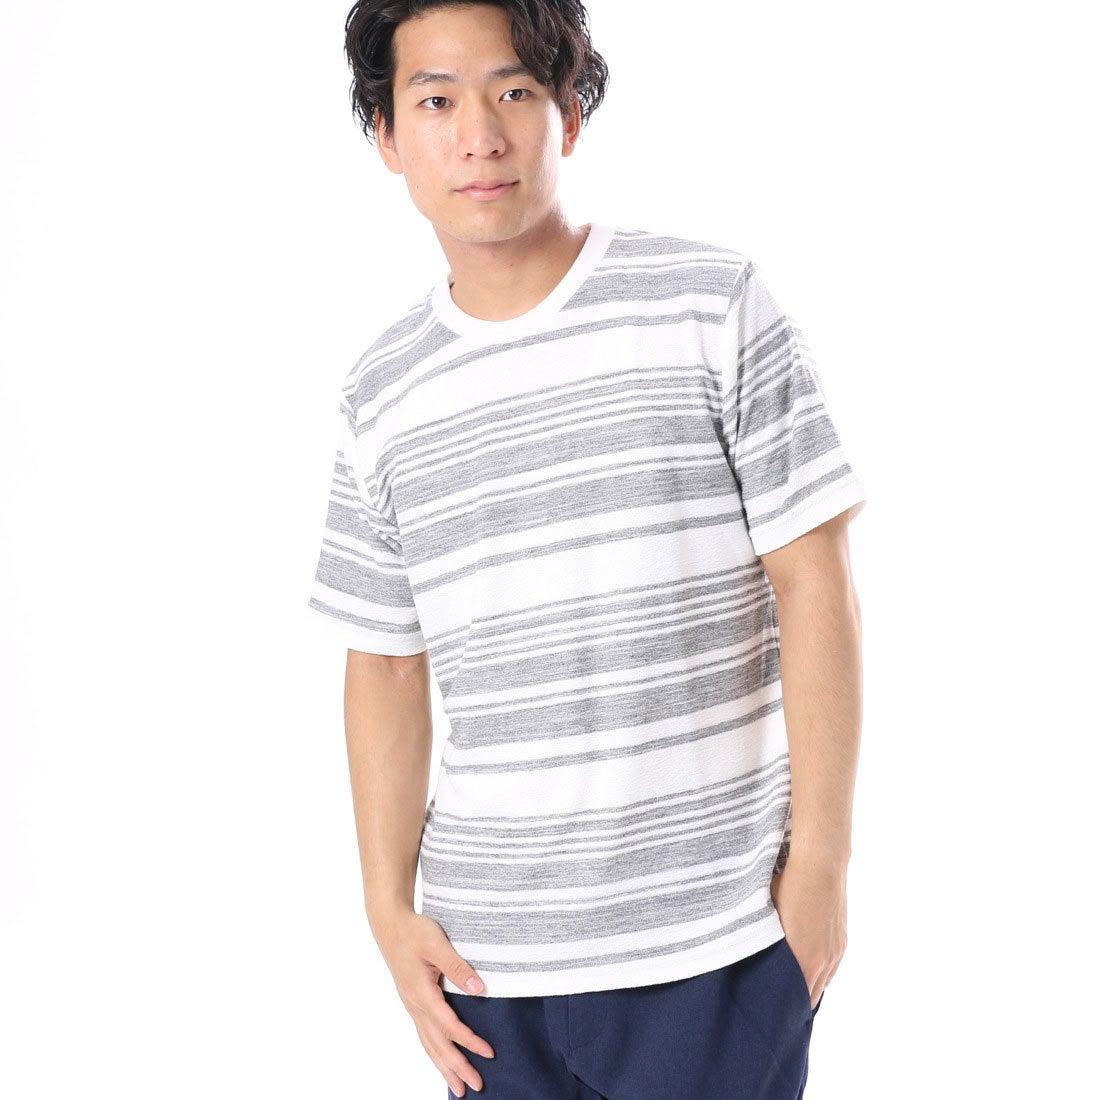 【SALE 50%OFF】コムサイズム COMME CA ISM かすれボーダーTシャツ (グレー)